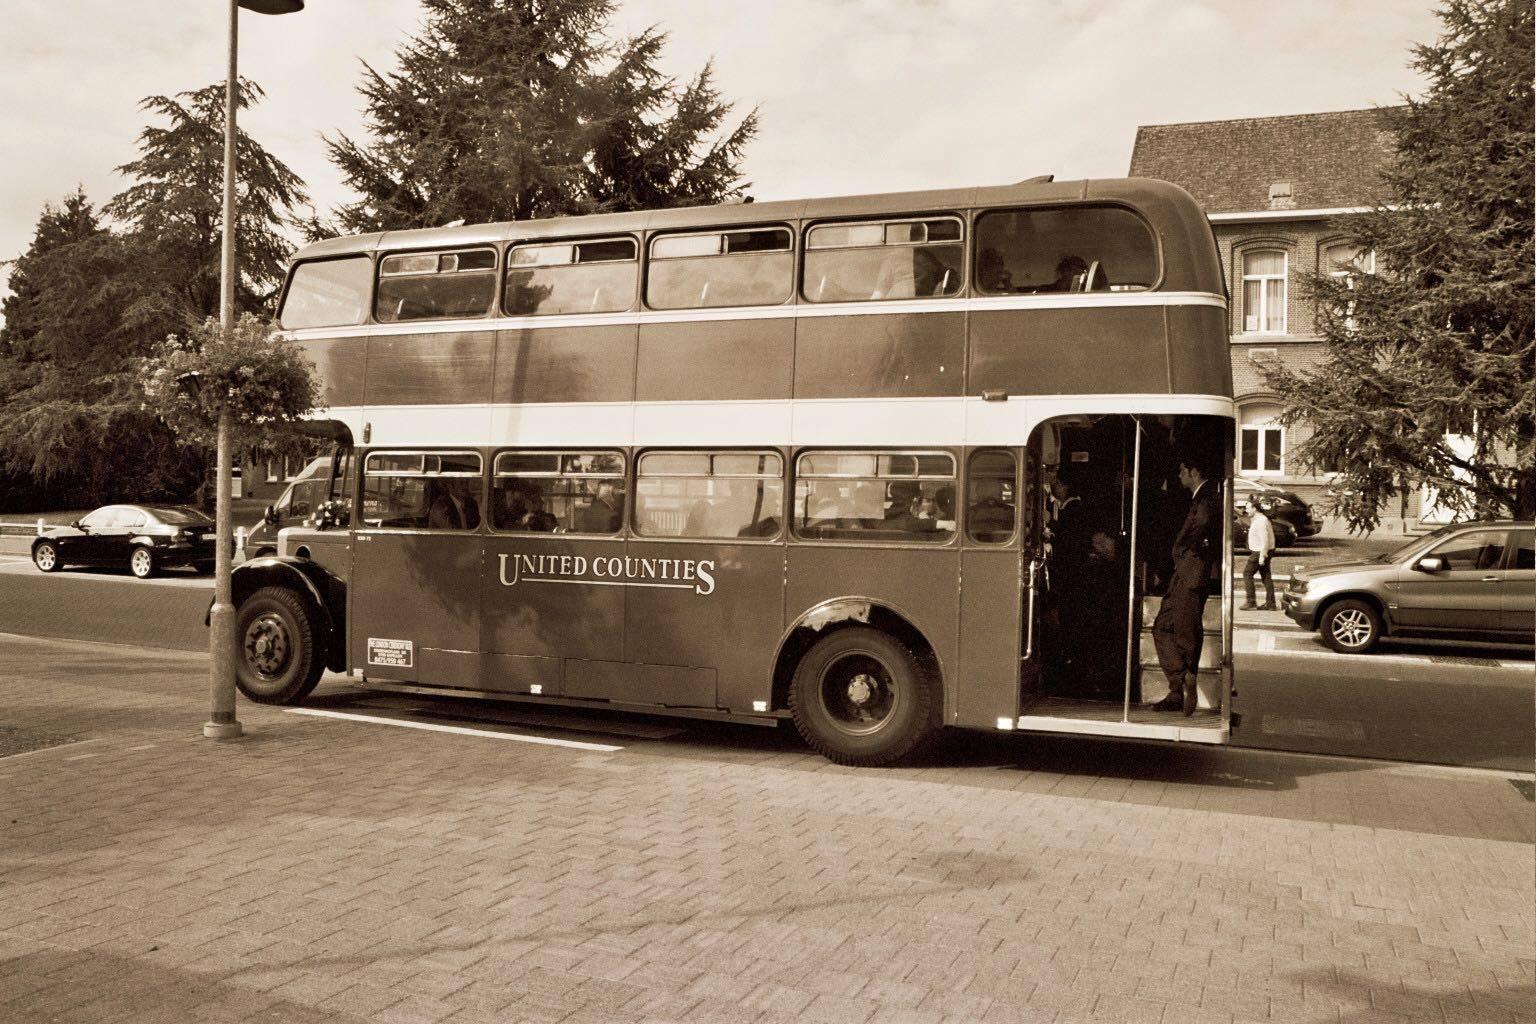 The London Ceremony Bus - Trouwvervoer - Ceremonievervoer - Bus - House of Weddings - 22